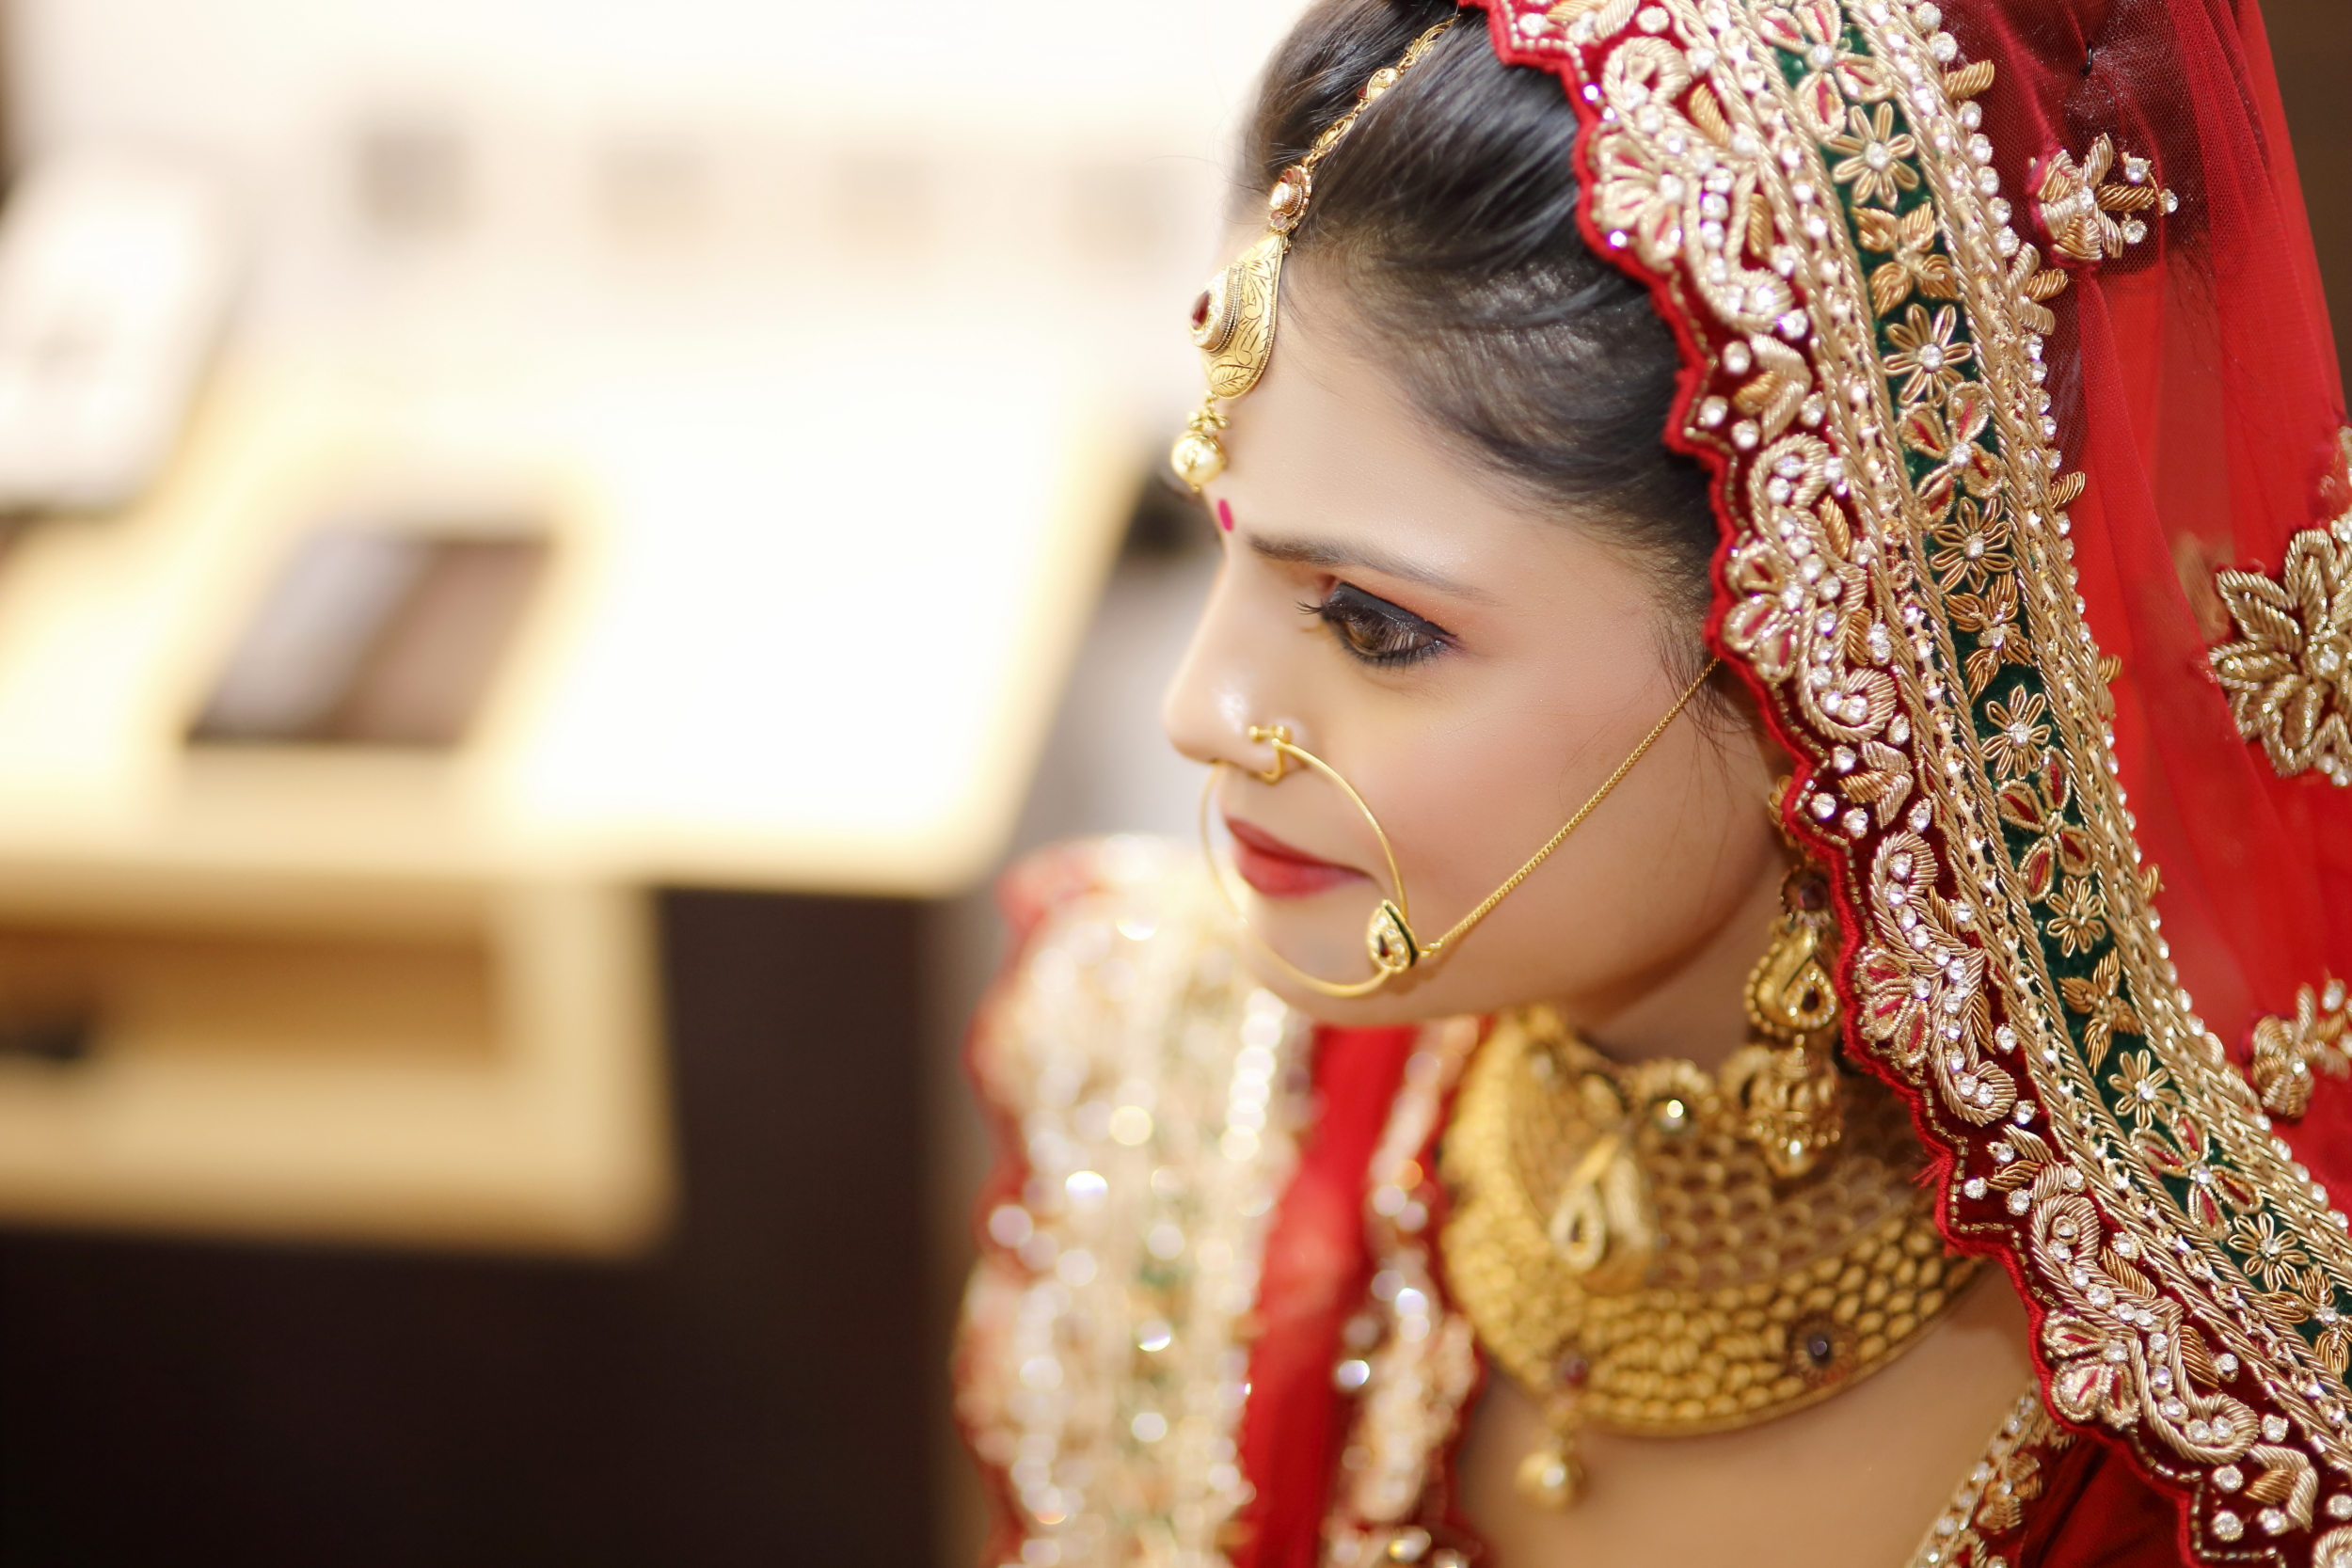 Best candid wedding -8 TWR Photographer Delhi NCR